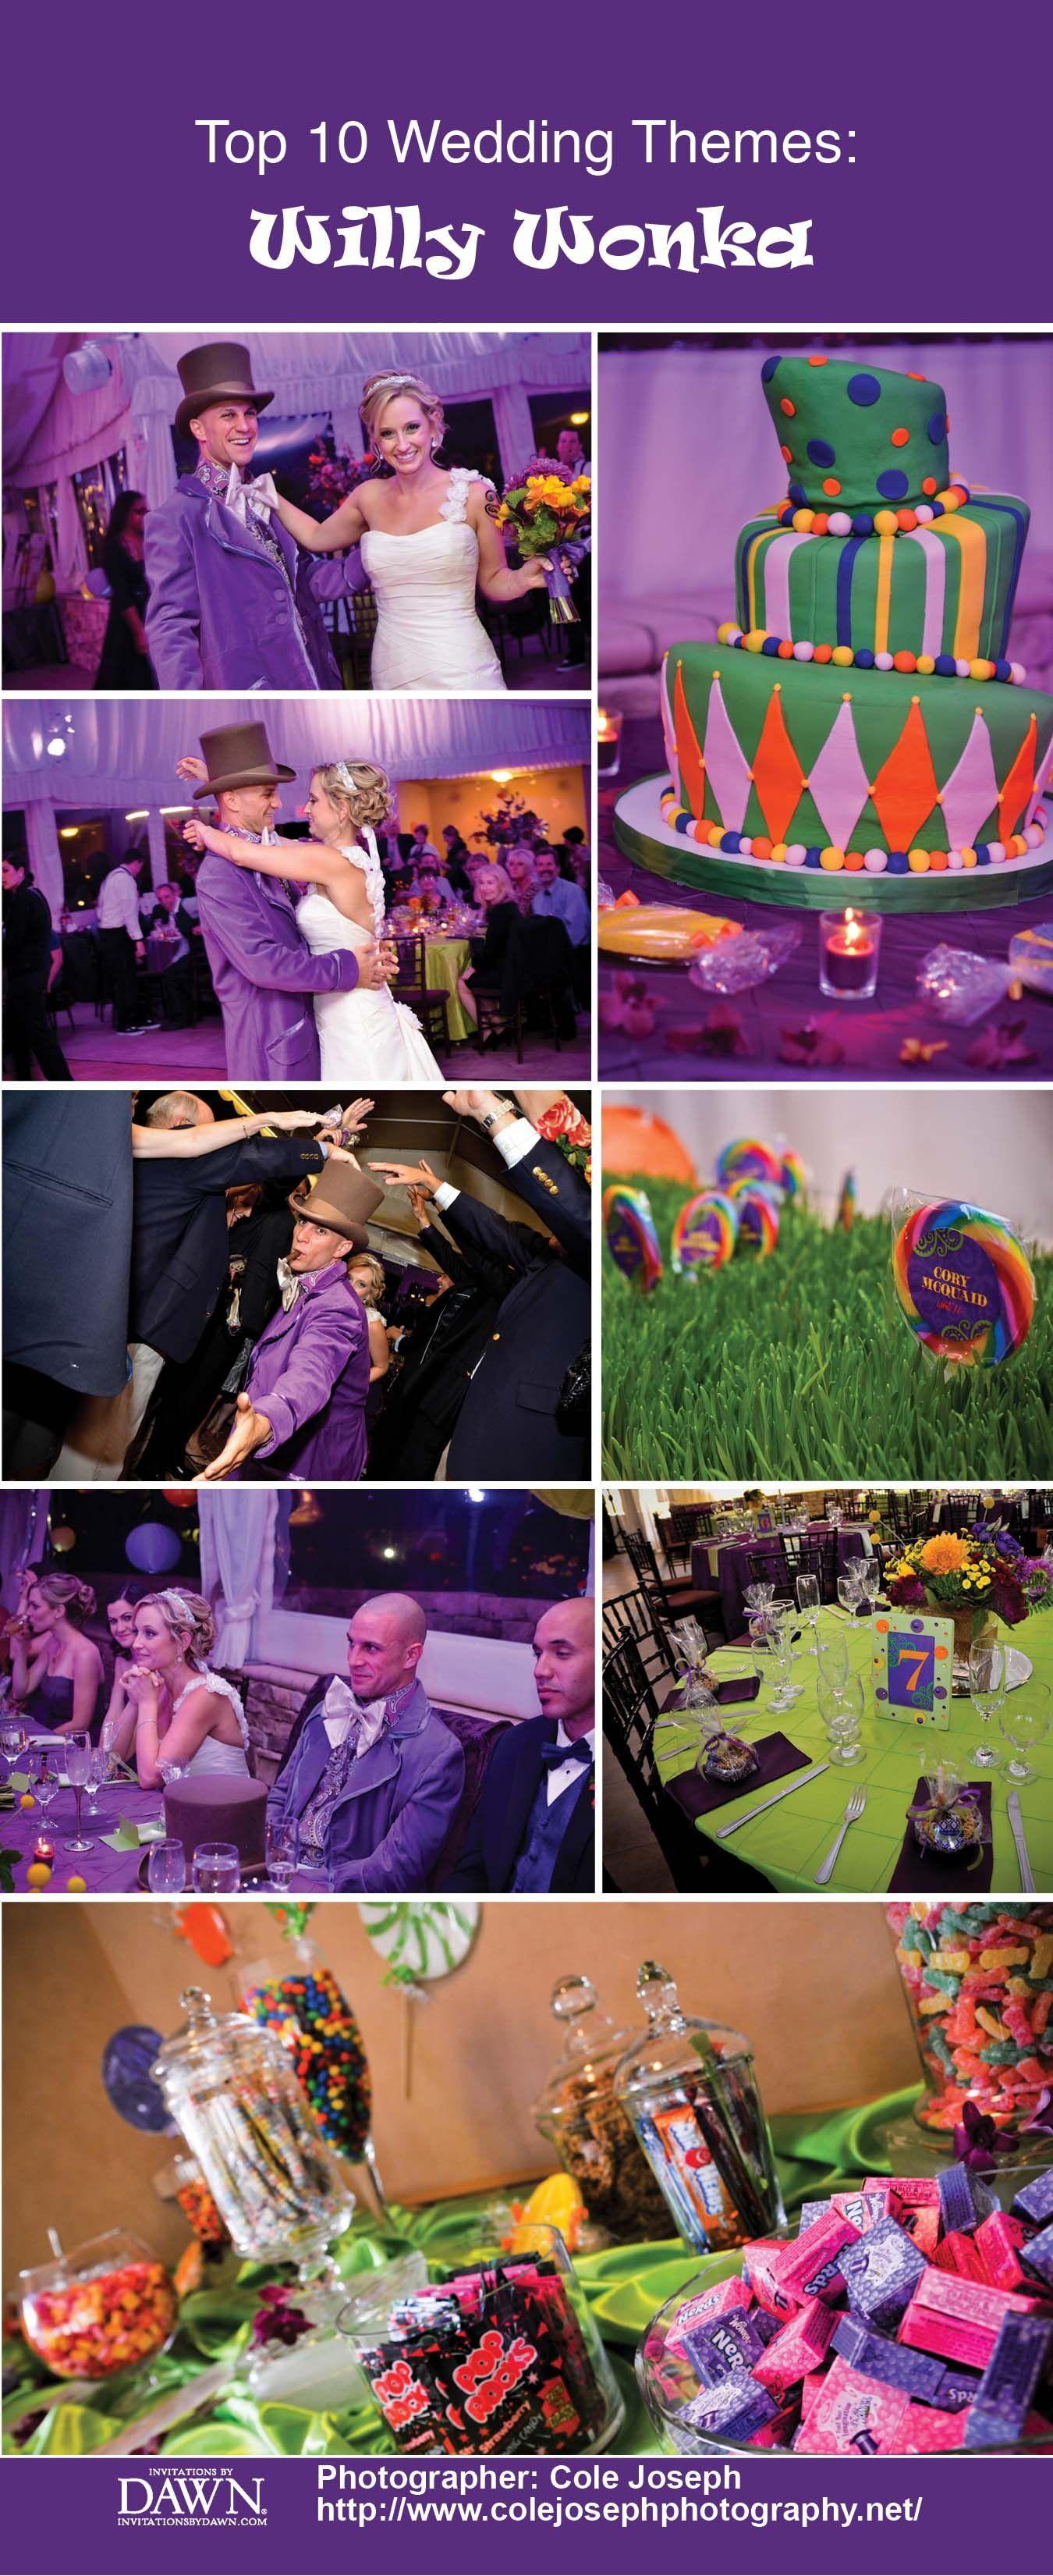 Charmant Top 10 Wedding Themes Ideen - Brautkleider Ideen ...